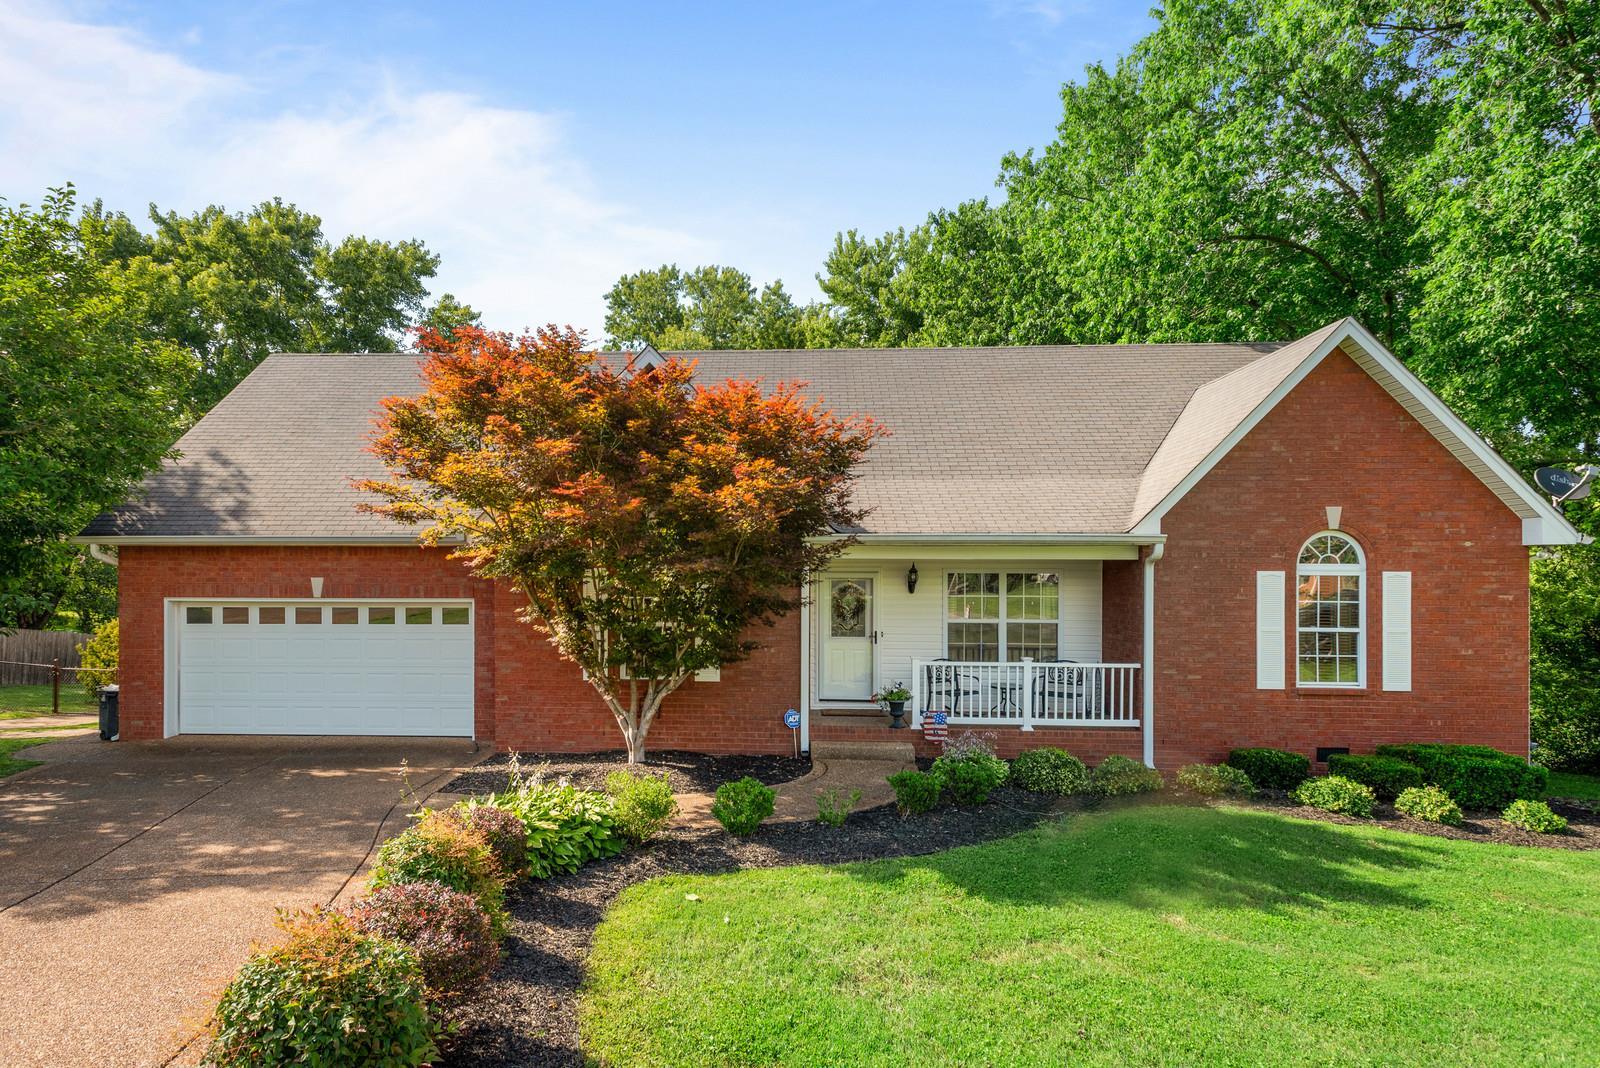 104 Dreamland Dr, Greenbrier, TN 37073 - Greenbrier, TN real estate listing